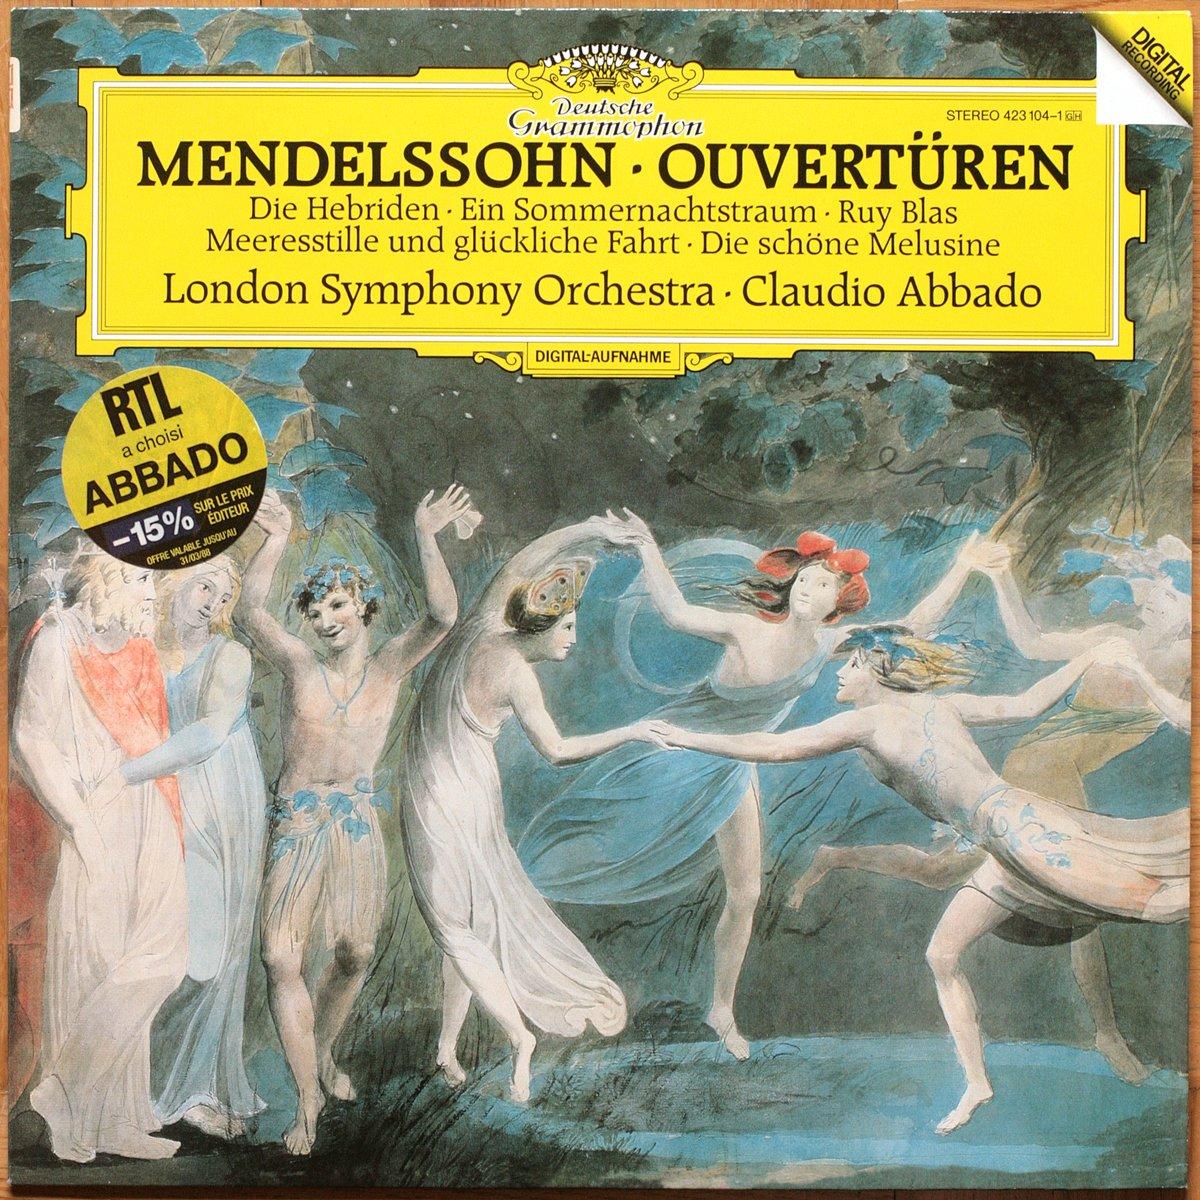 DGG 423 104 Mendelssohn Ouvertures Abbado